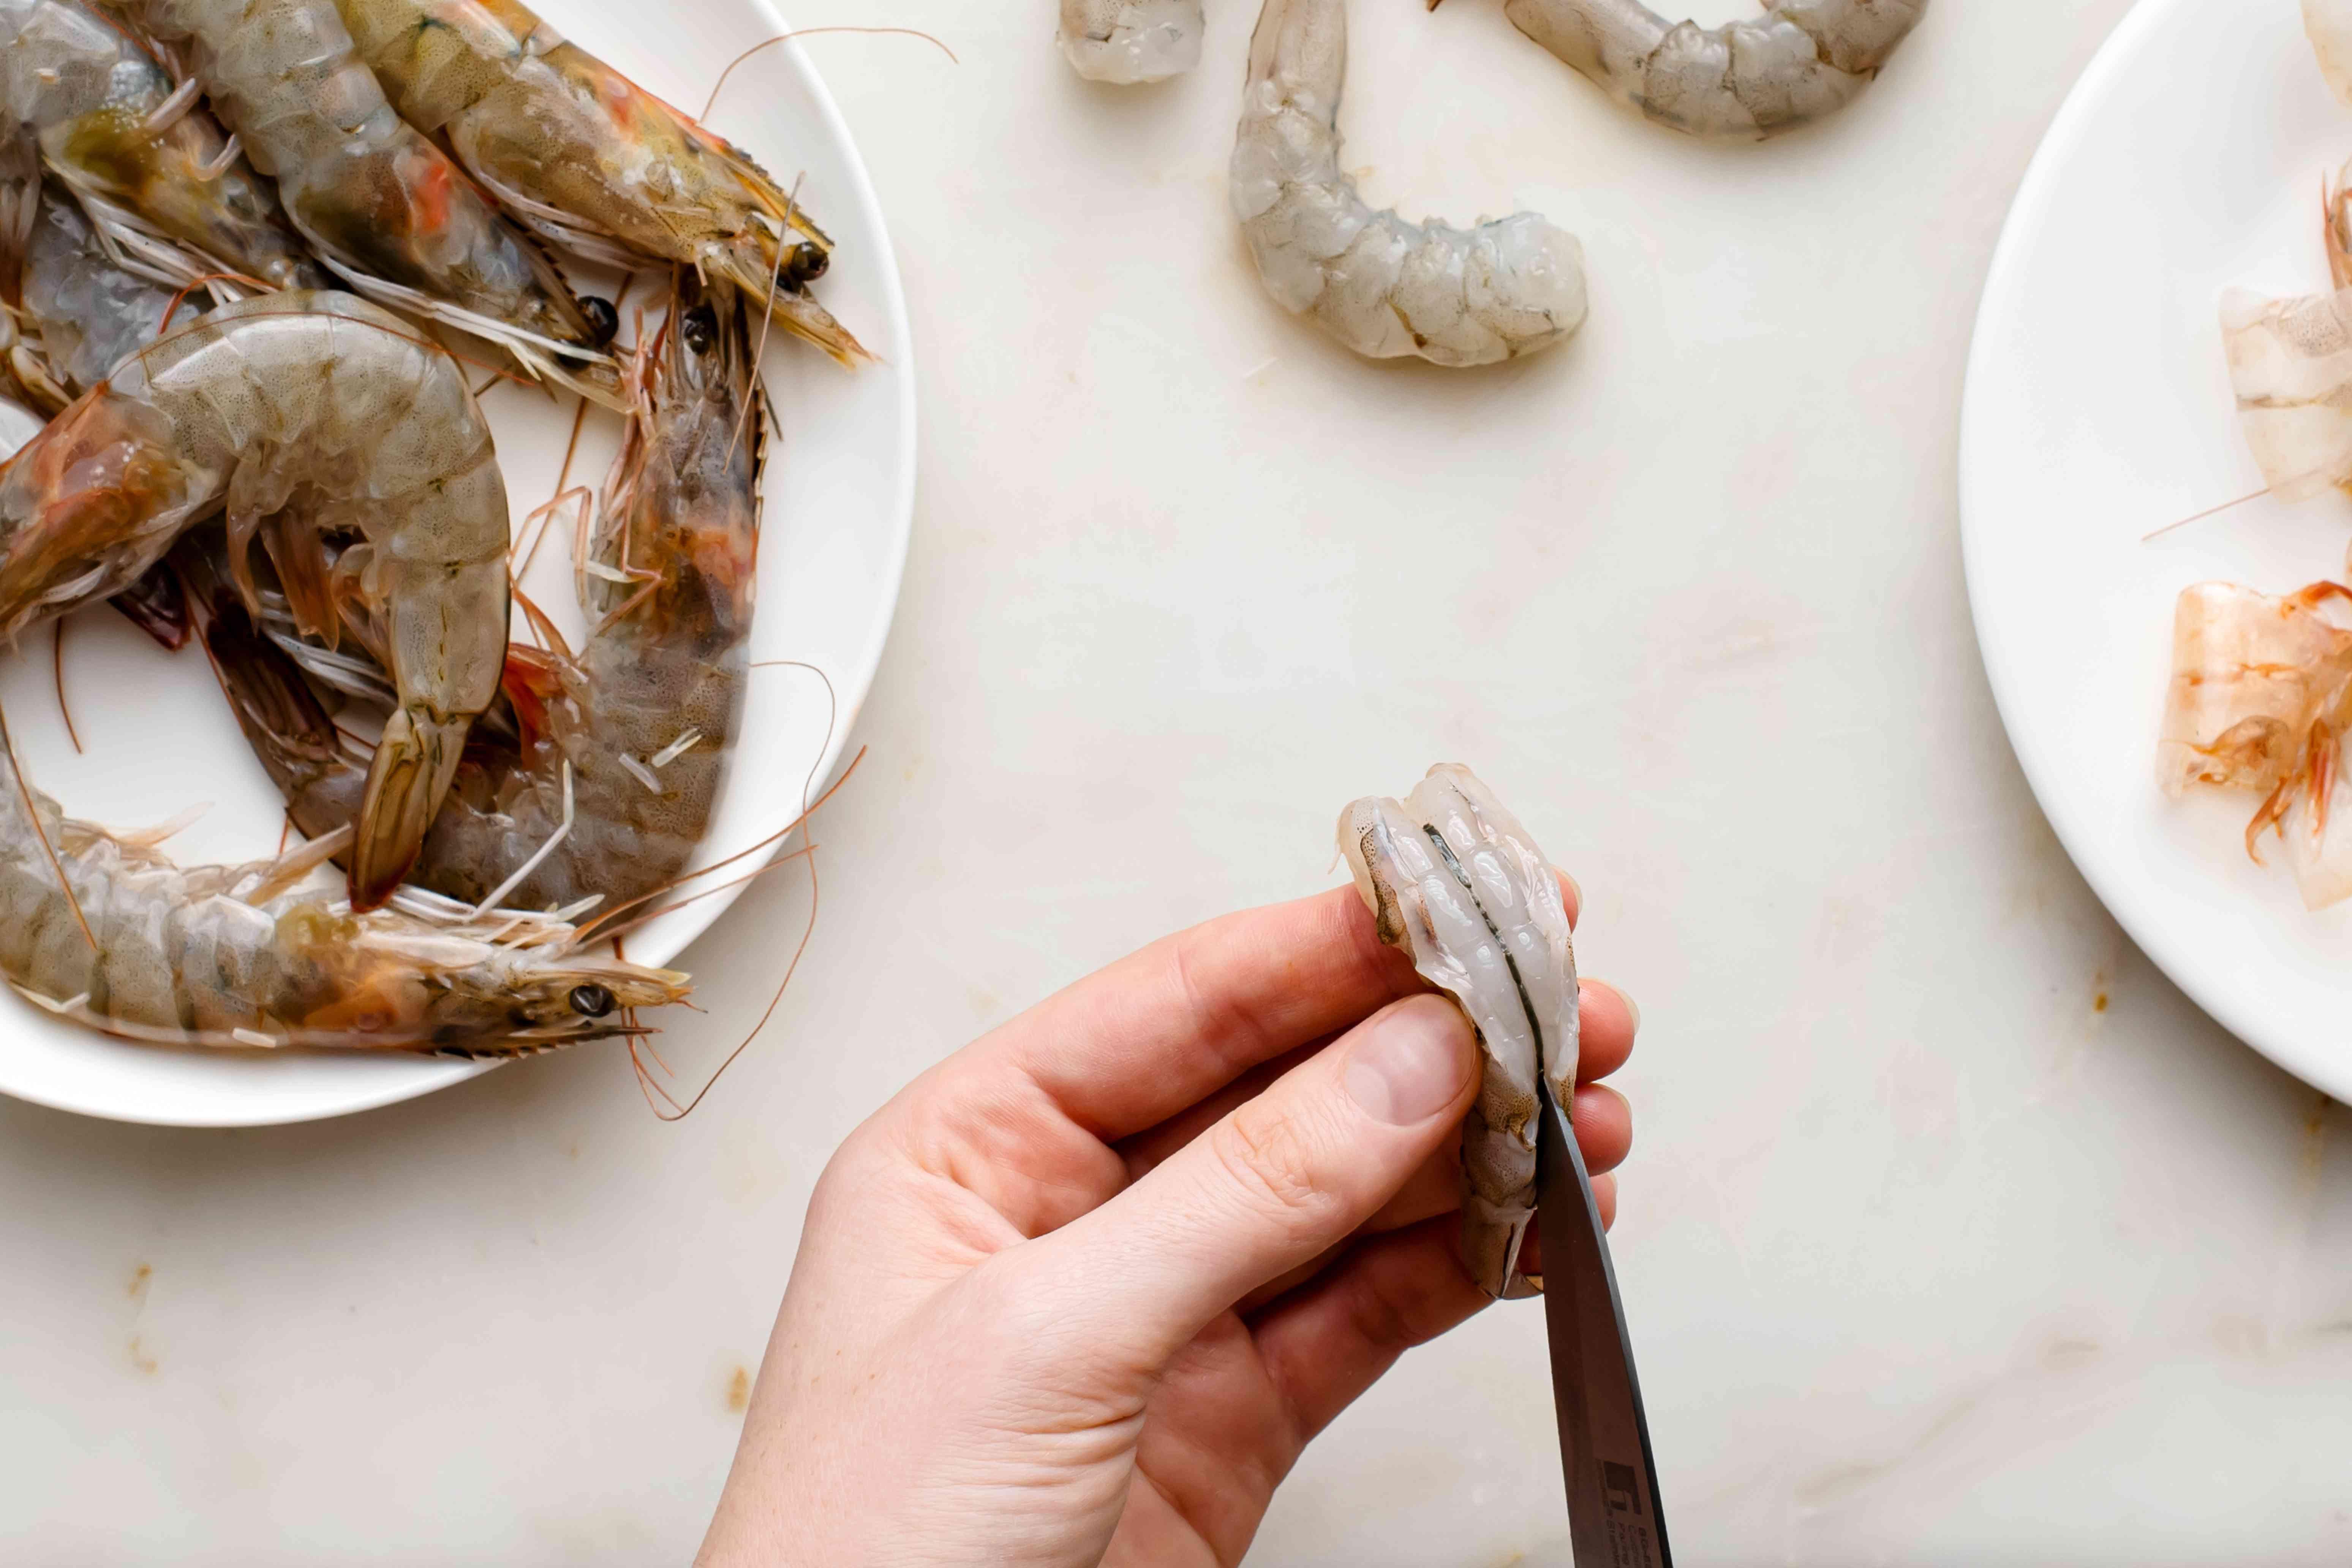 clean raw shrimp